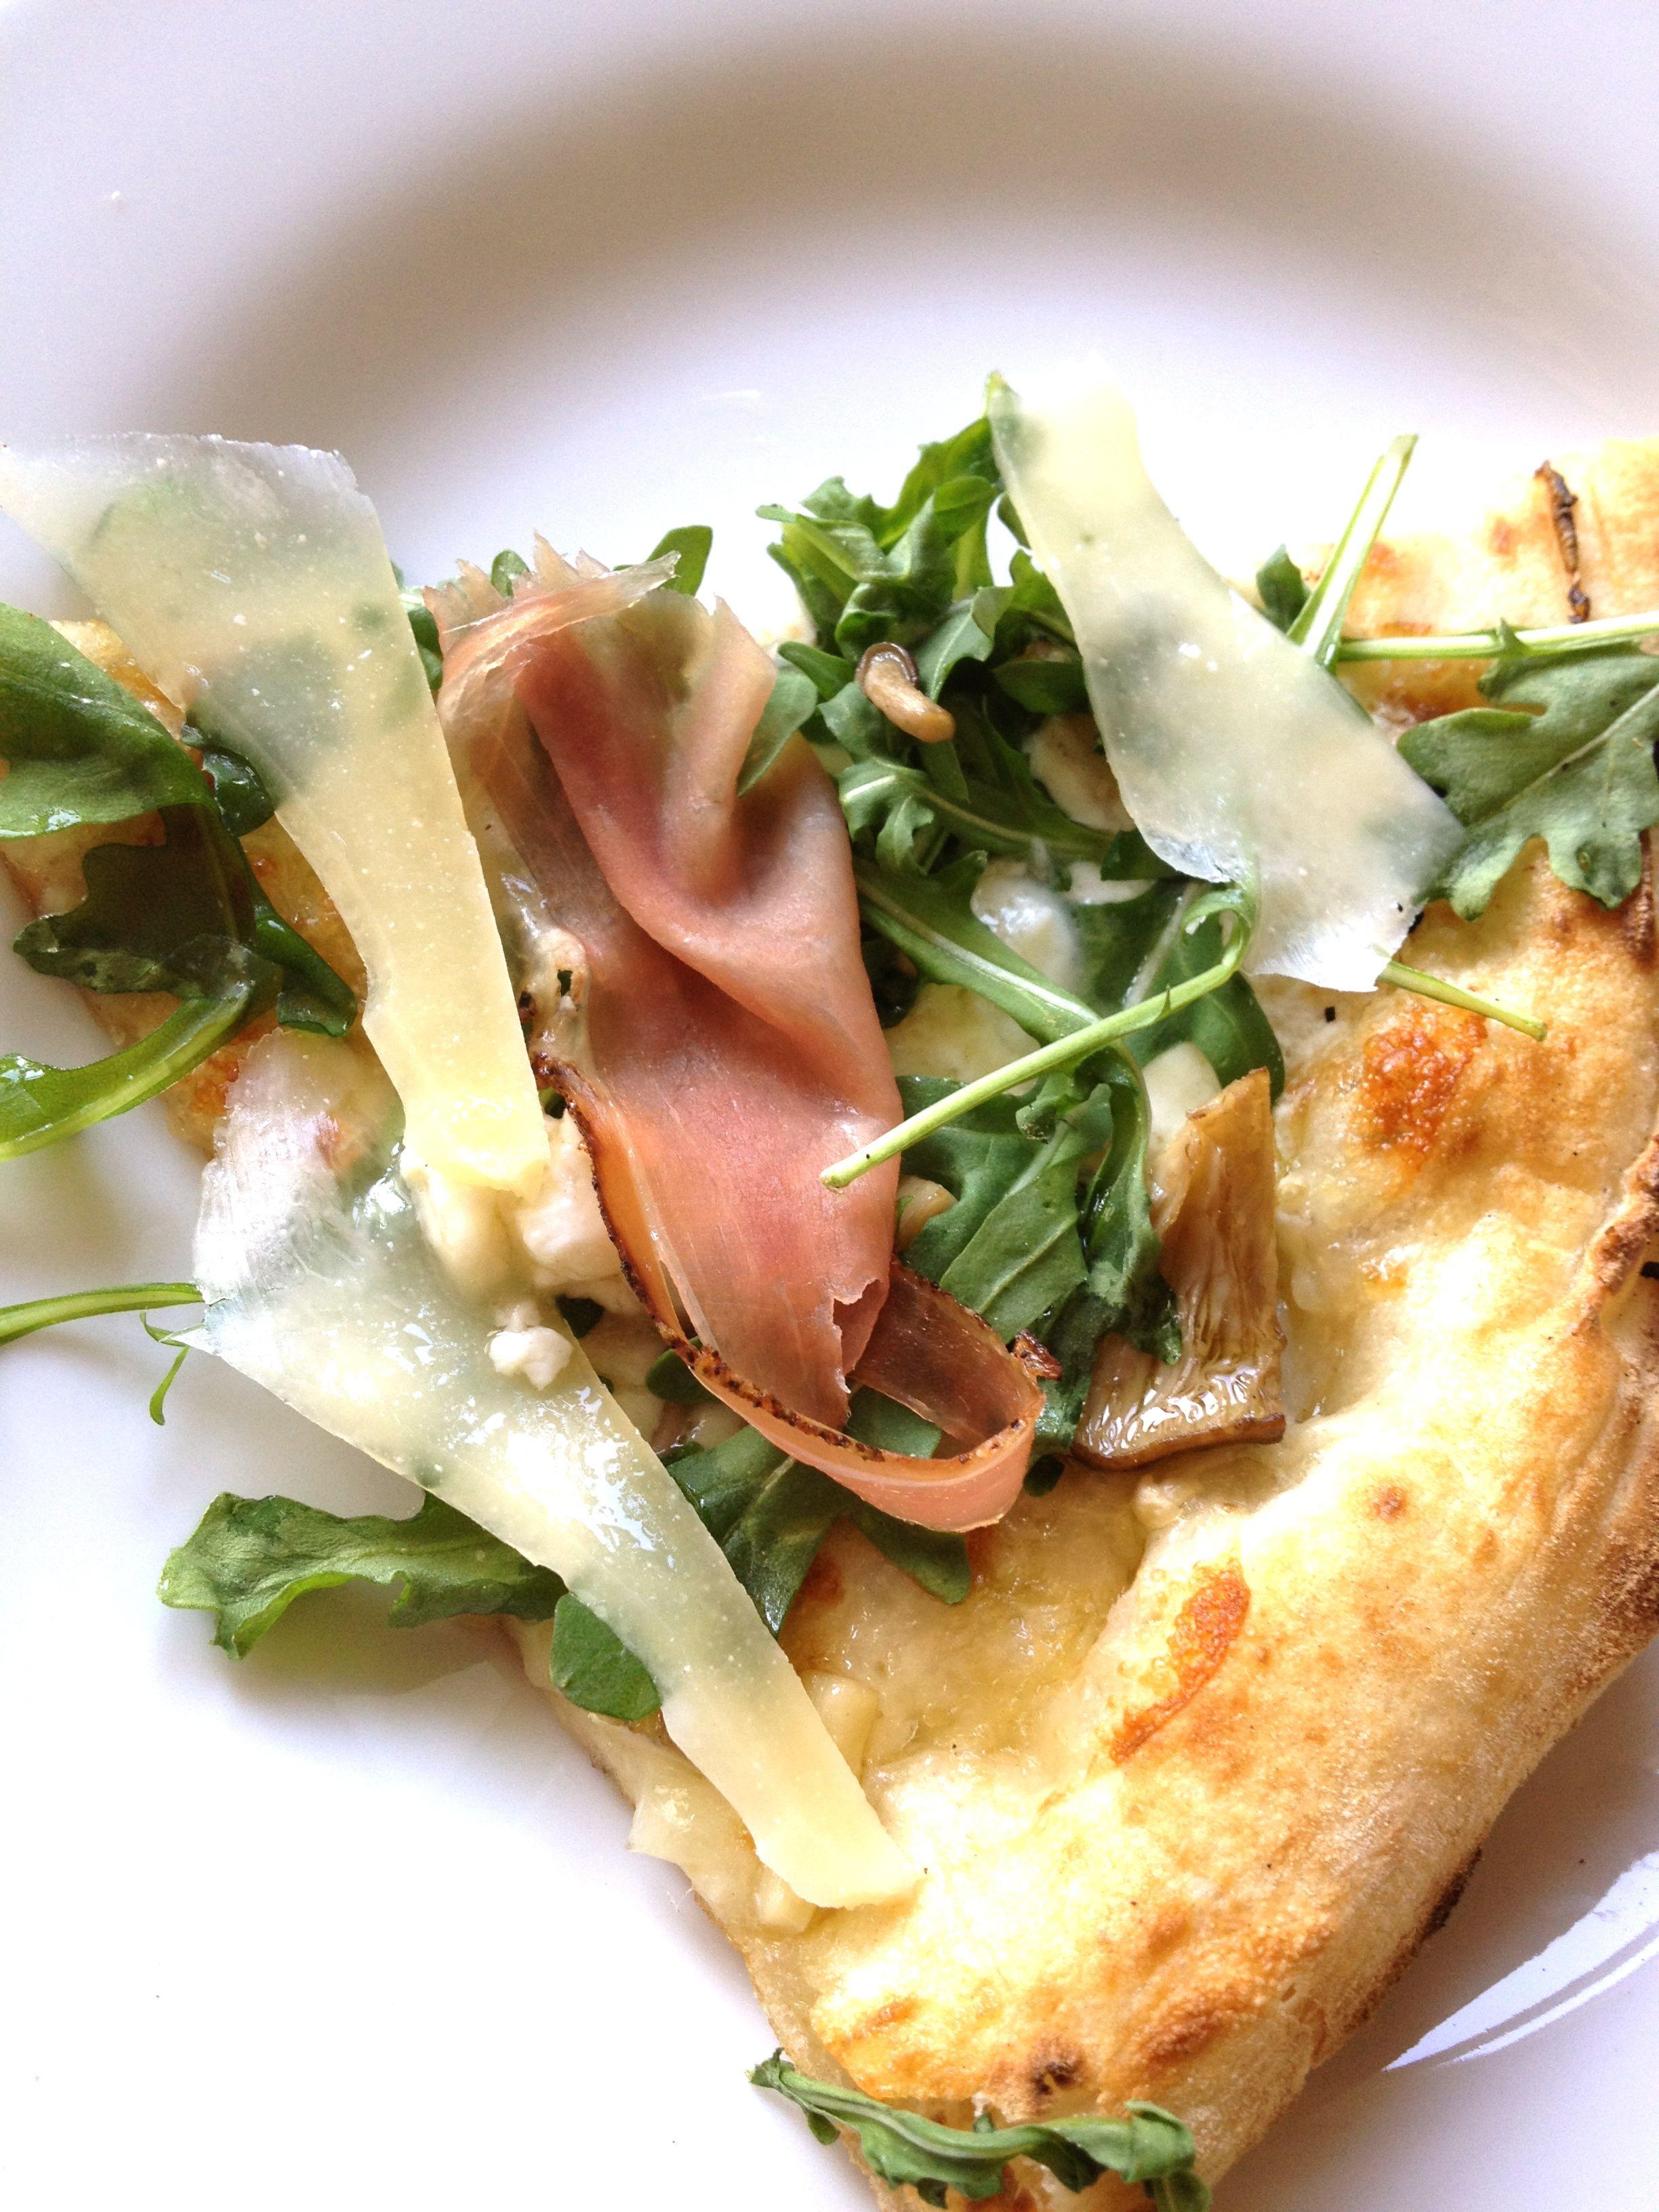 ... pizza recipes dishmaps wild rice and mushroom soup wild mushroom melt